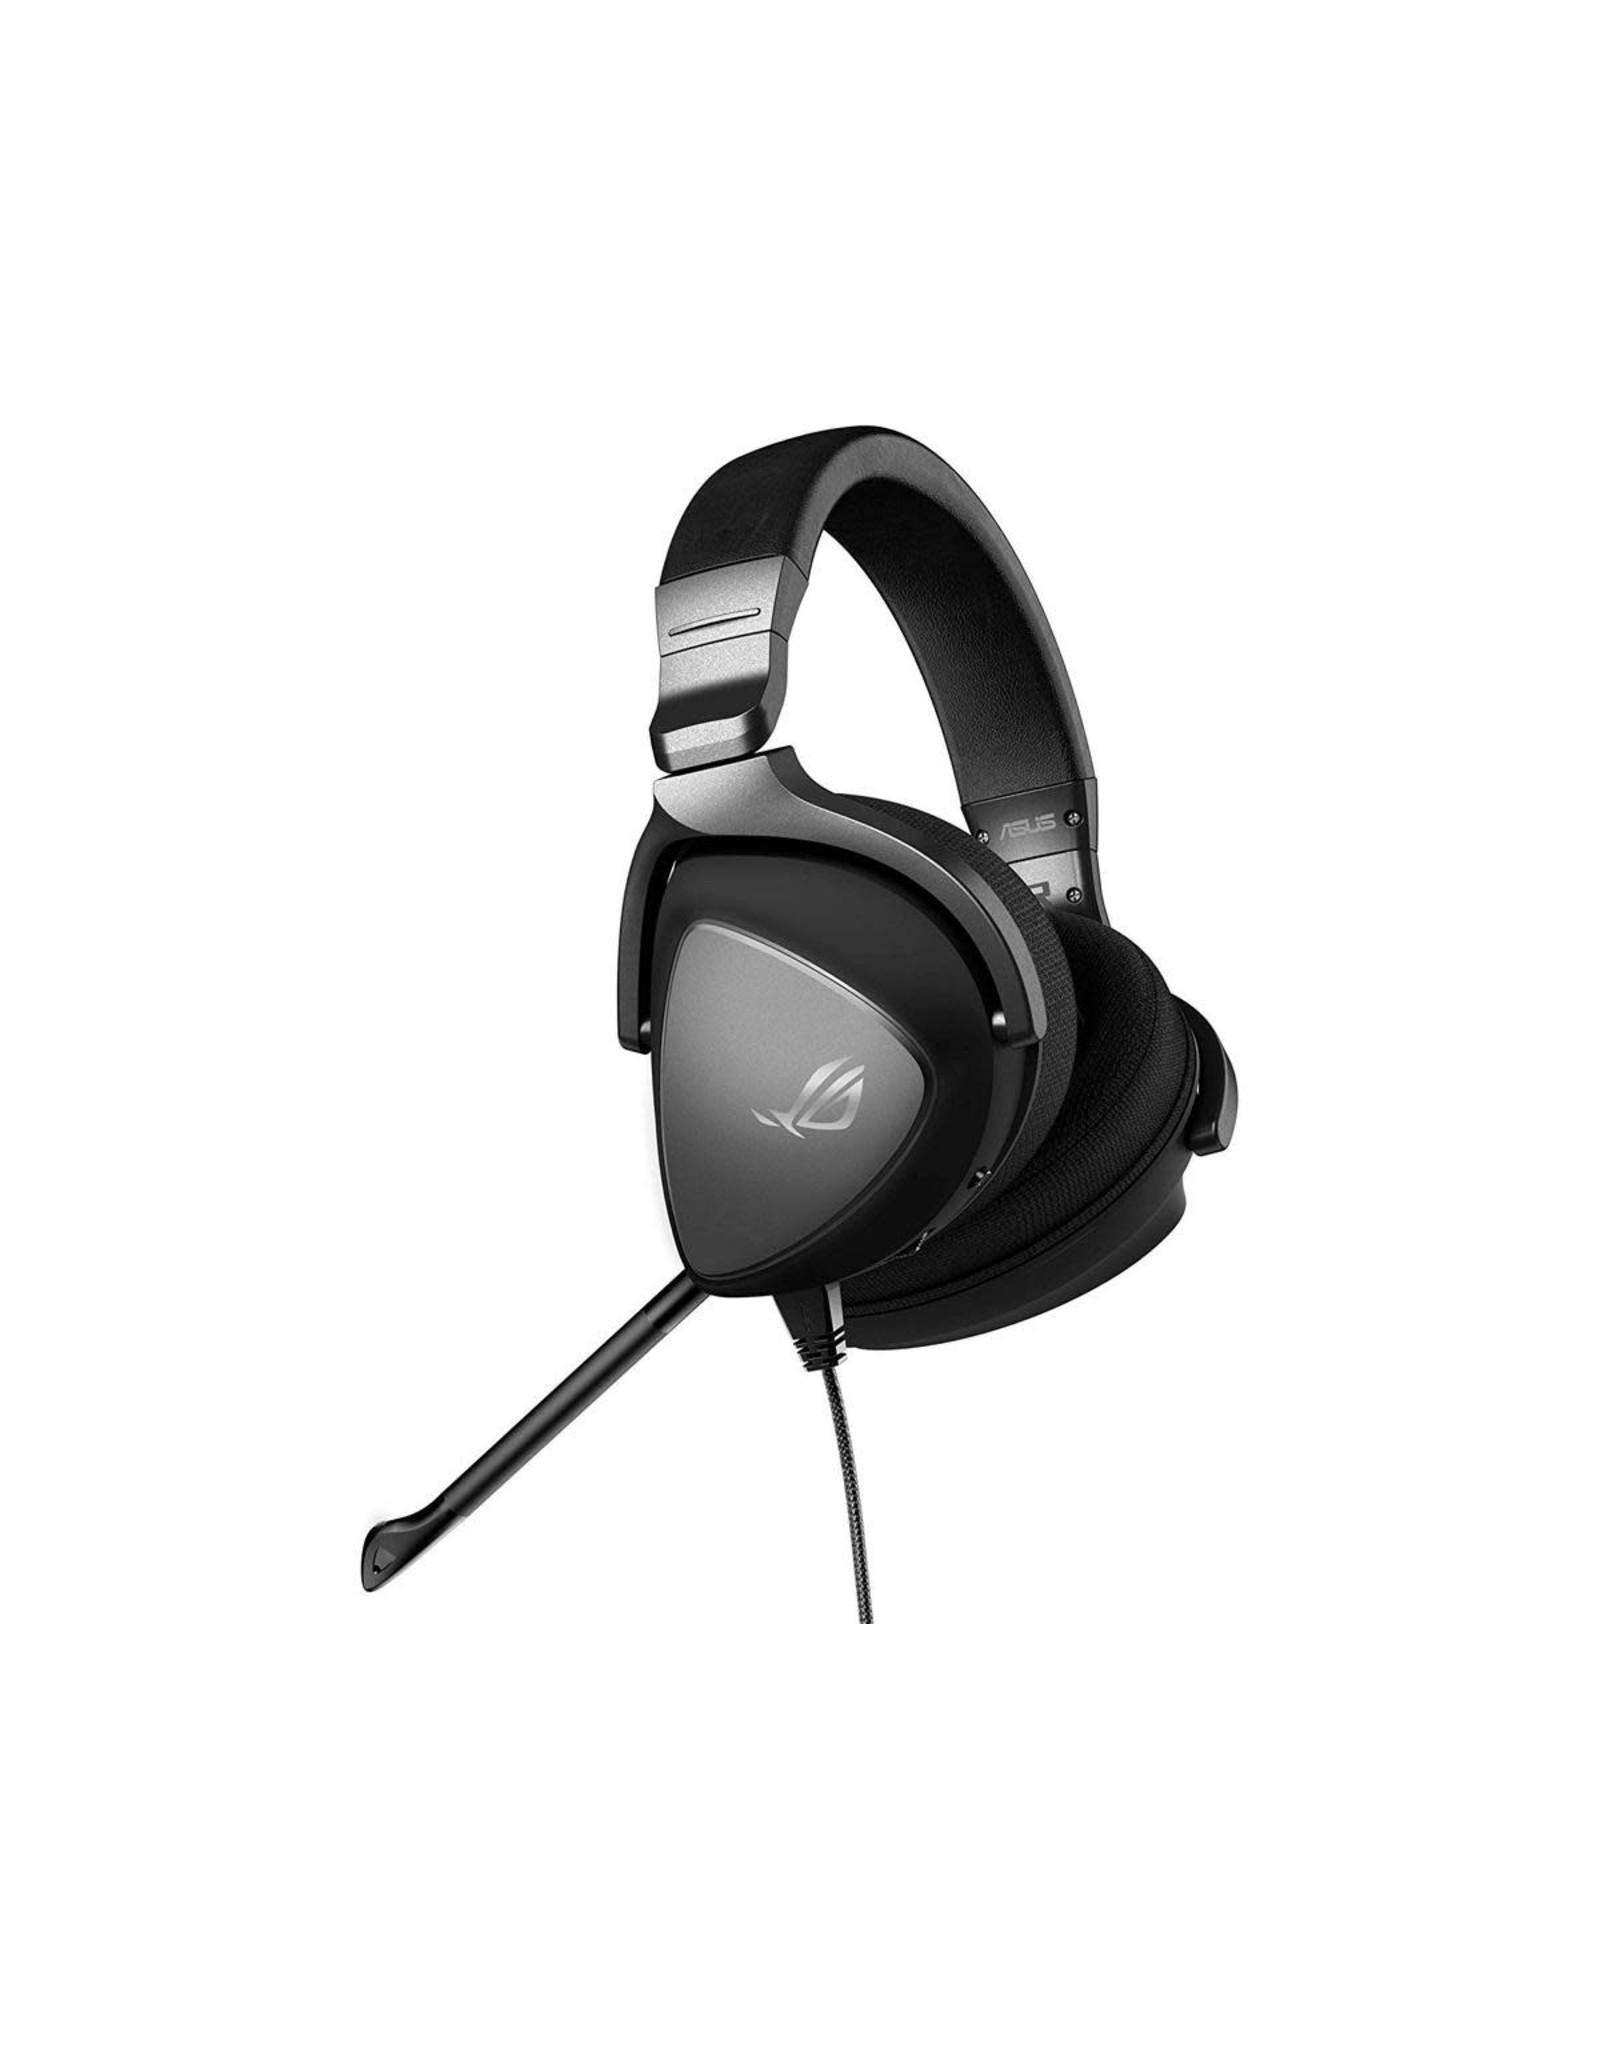 ASUS Headset - ASUS ROG Delta Core Gaming